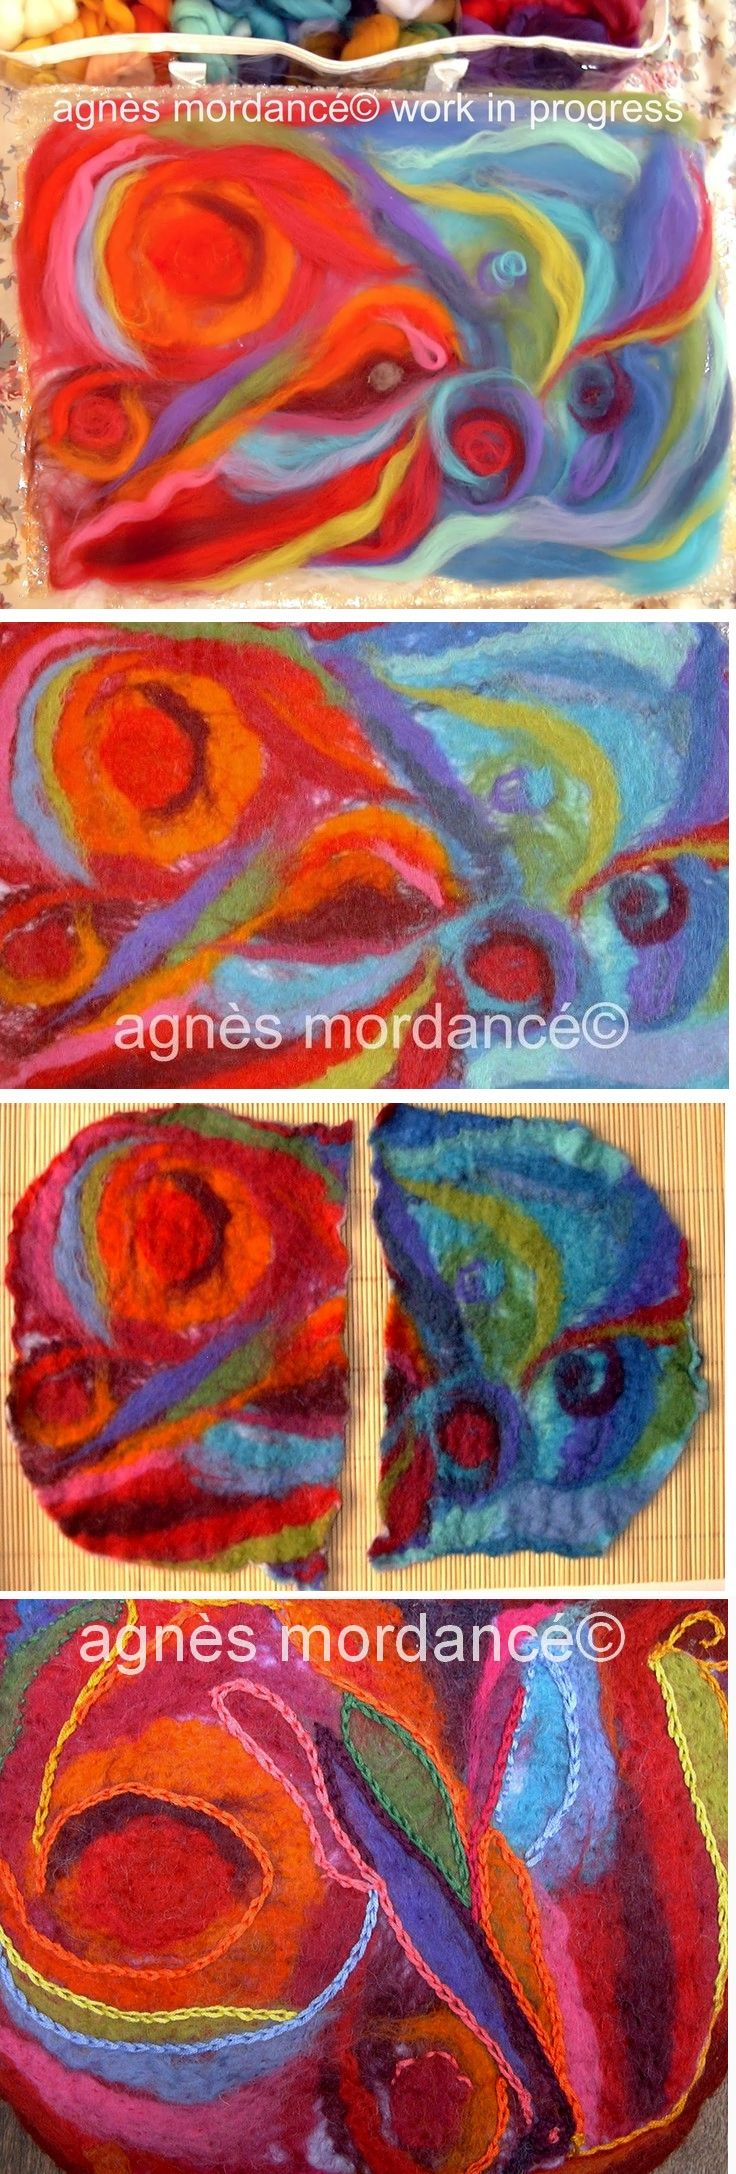 agnès mordancé© créations feutrées - felted art work in progress http://agnesmordance.blogspot.fr/